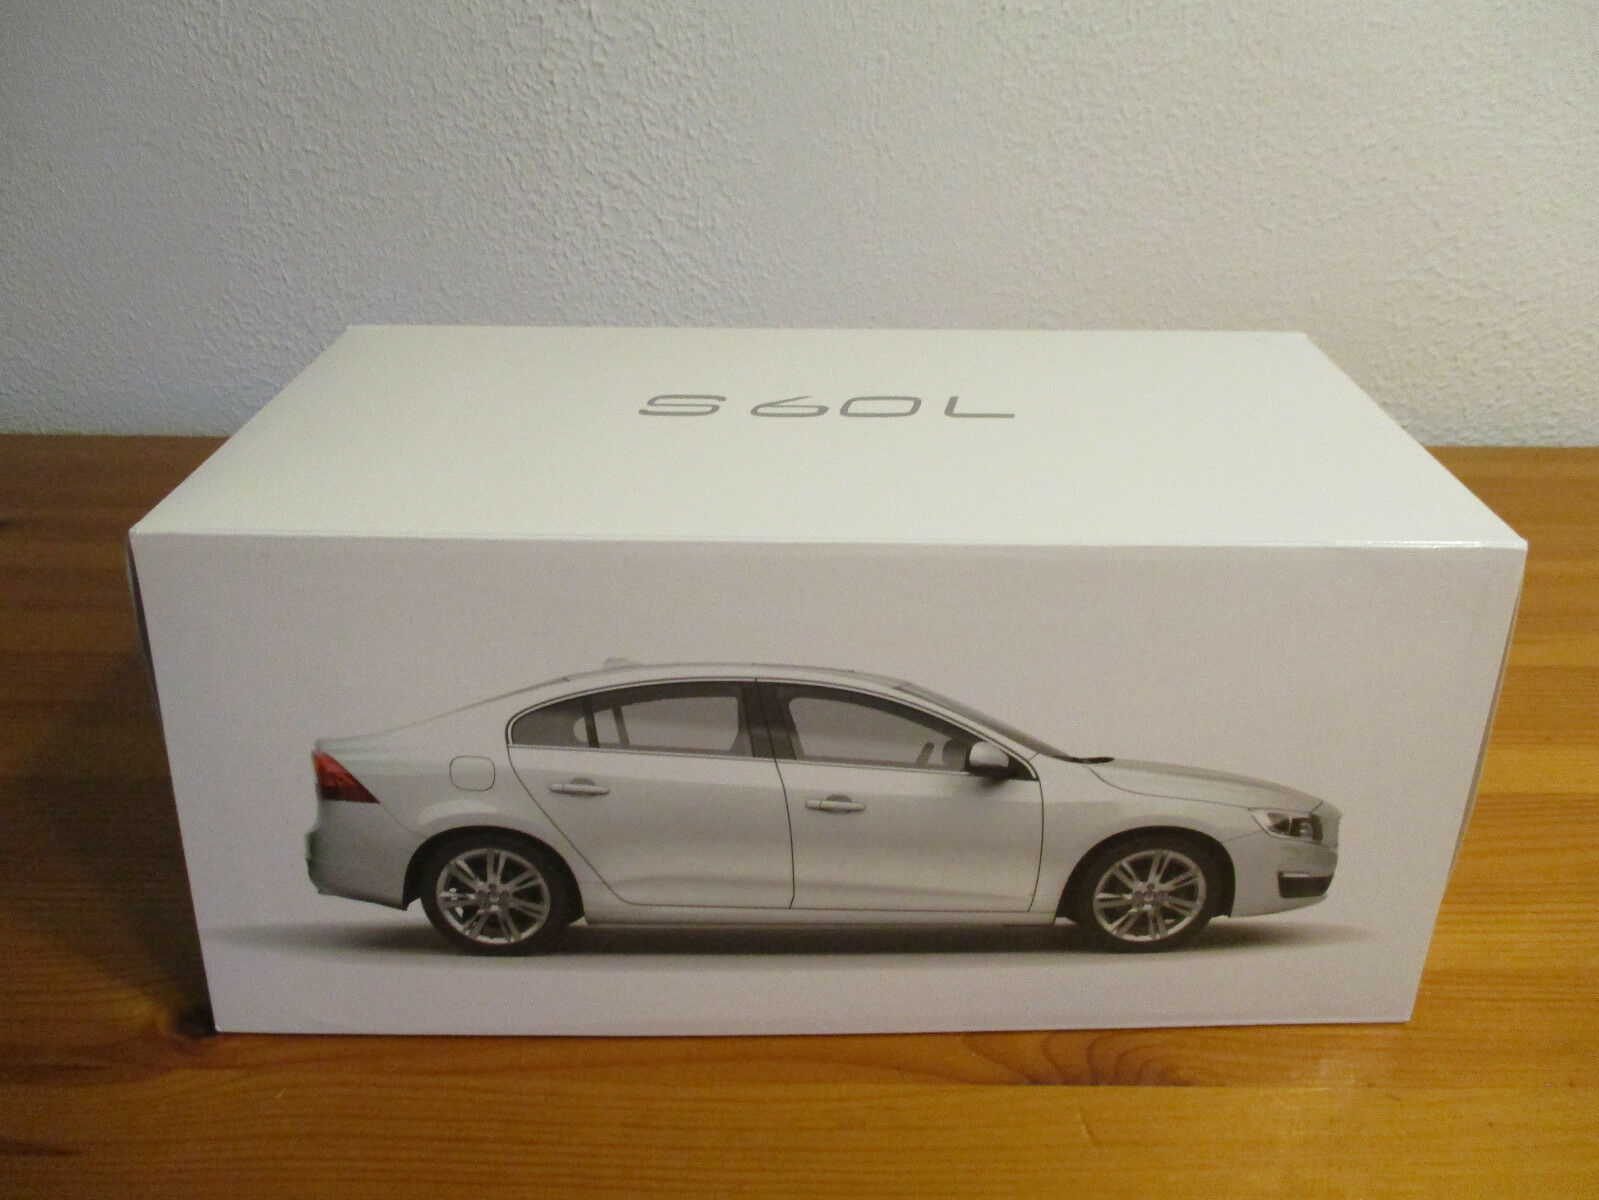 (gor) 1 18 CSM Volvo s60 L NEW OVP